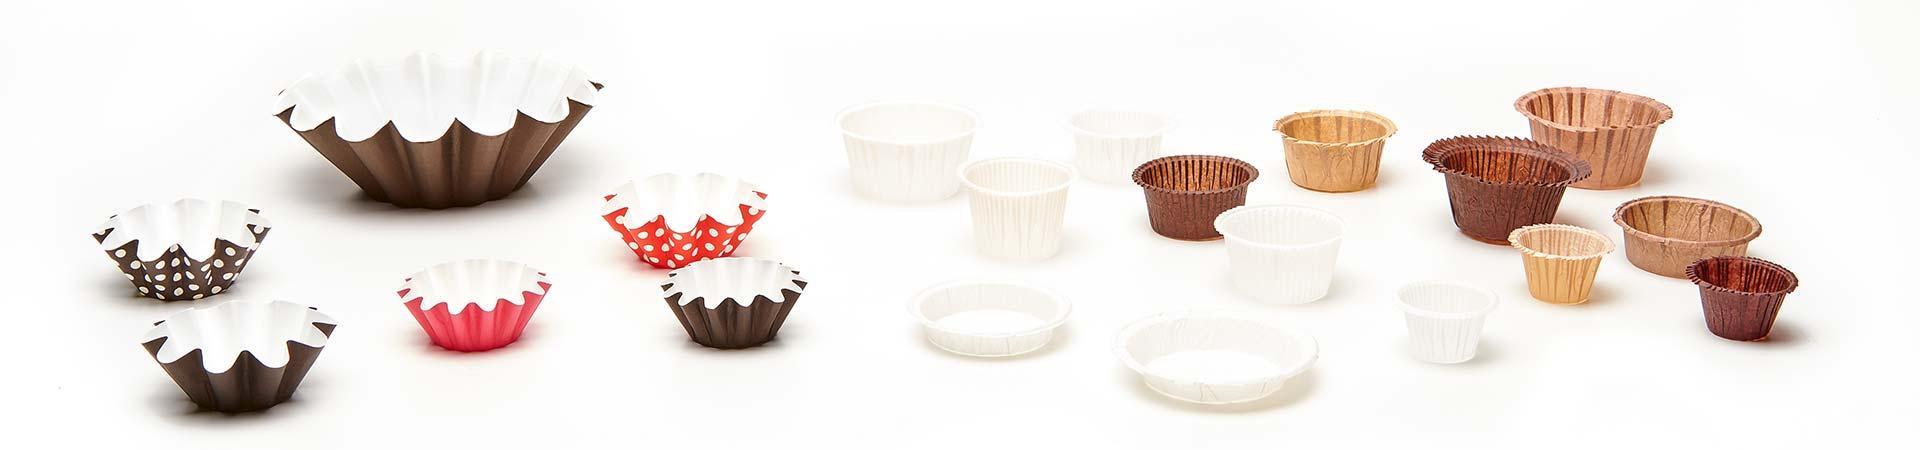 Novacart PBA series paper baking cups